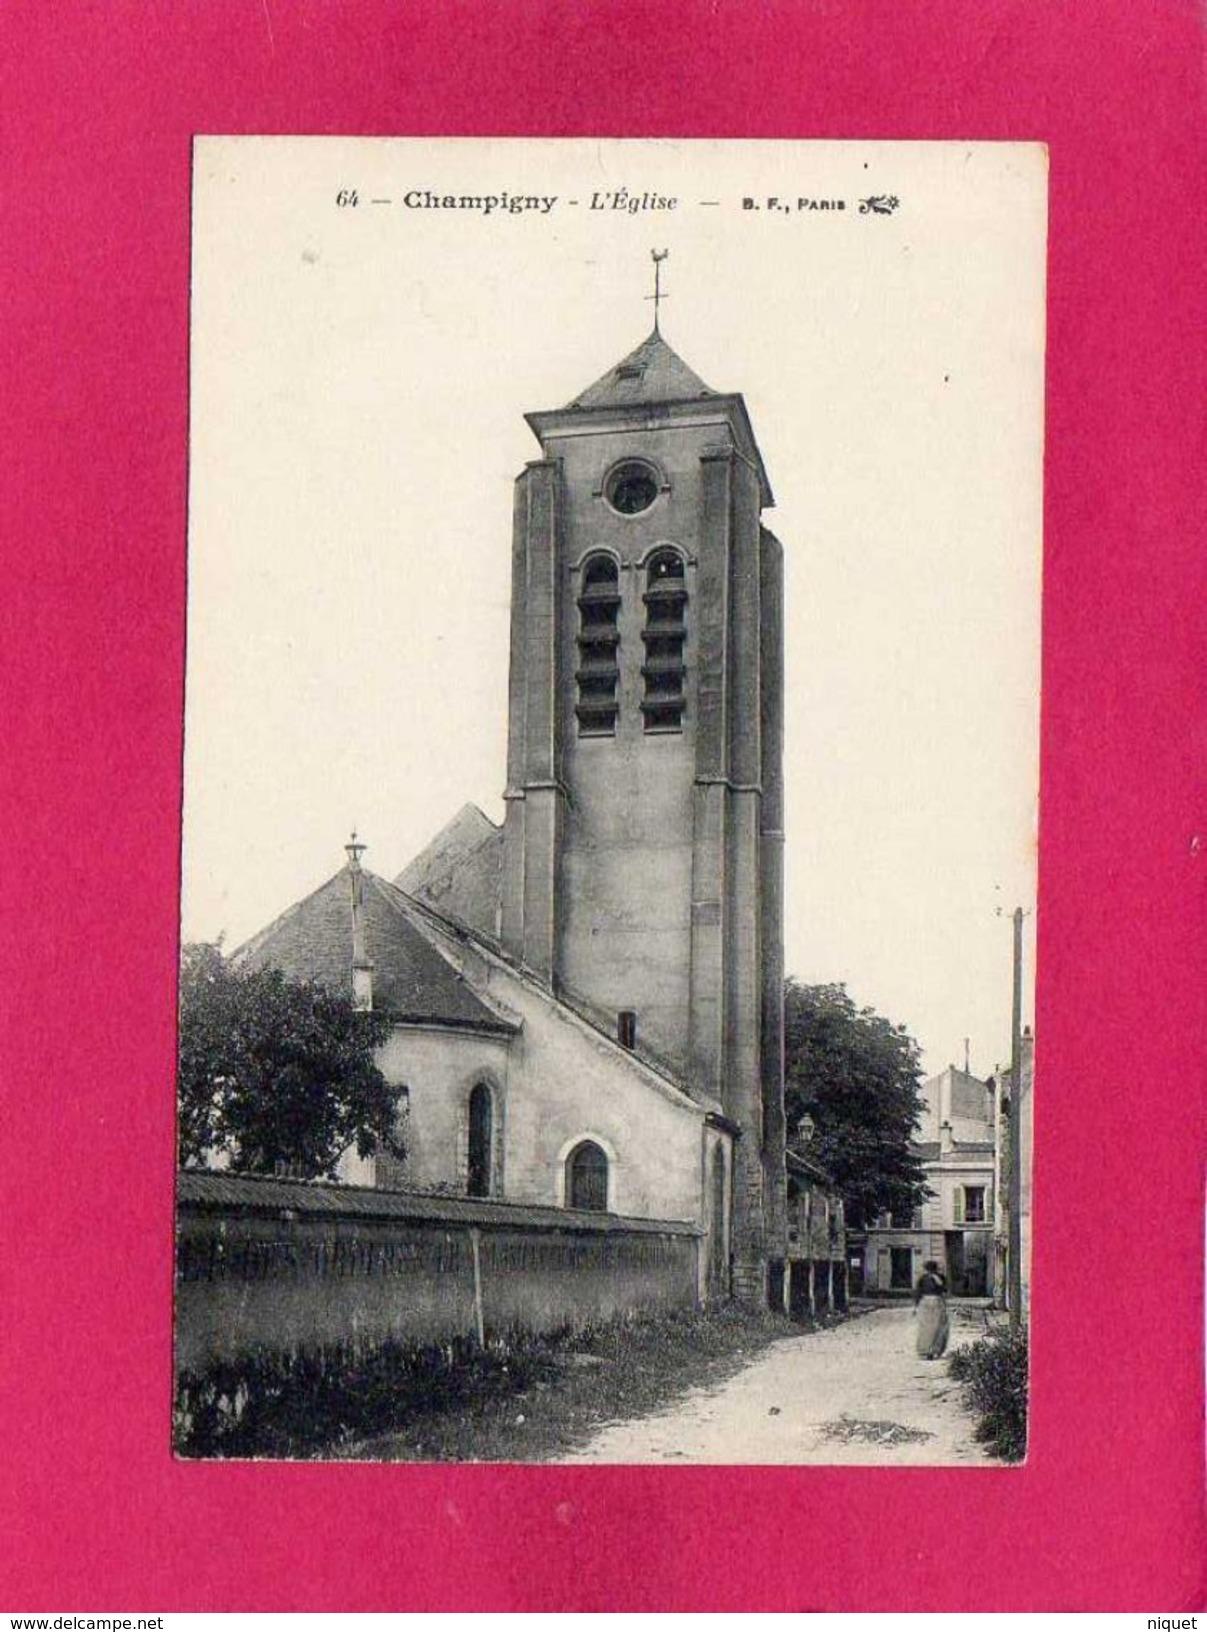 77 SEINE ET MARNE, CHAMPIGNY, L'Eglise, Animée, (B. F.) - Francia